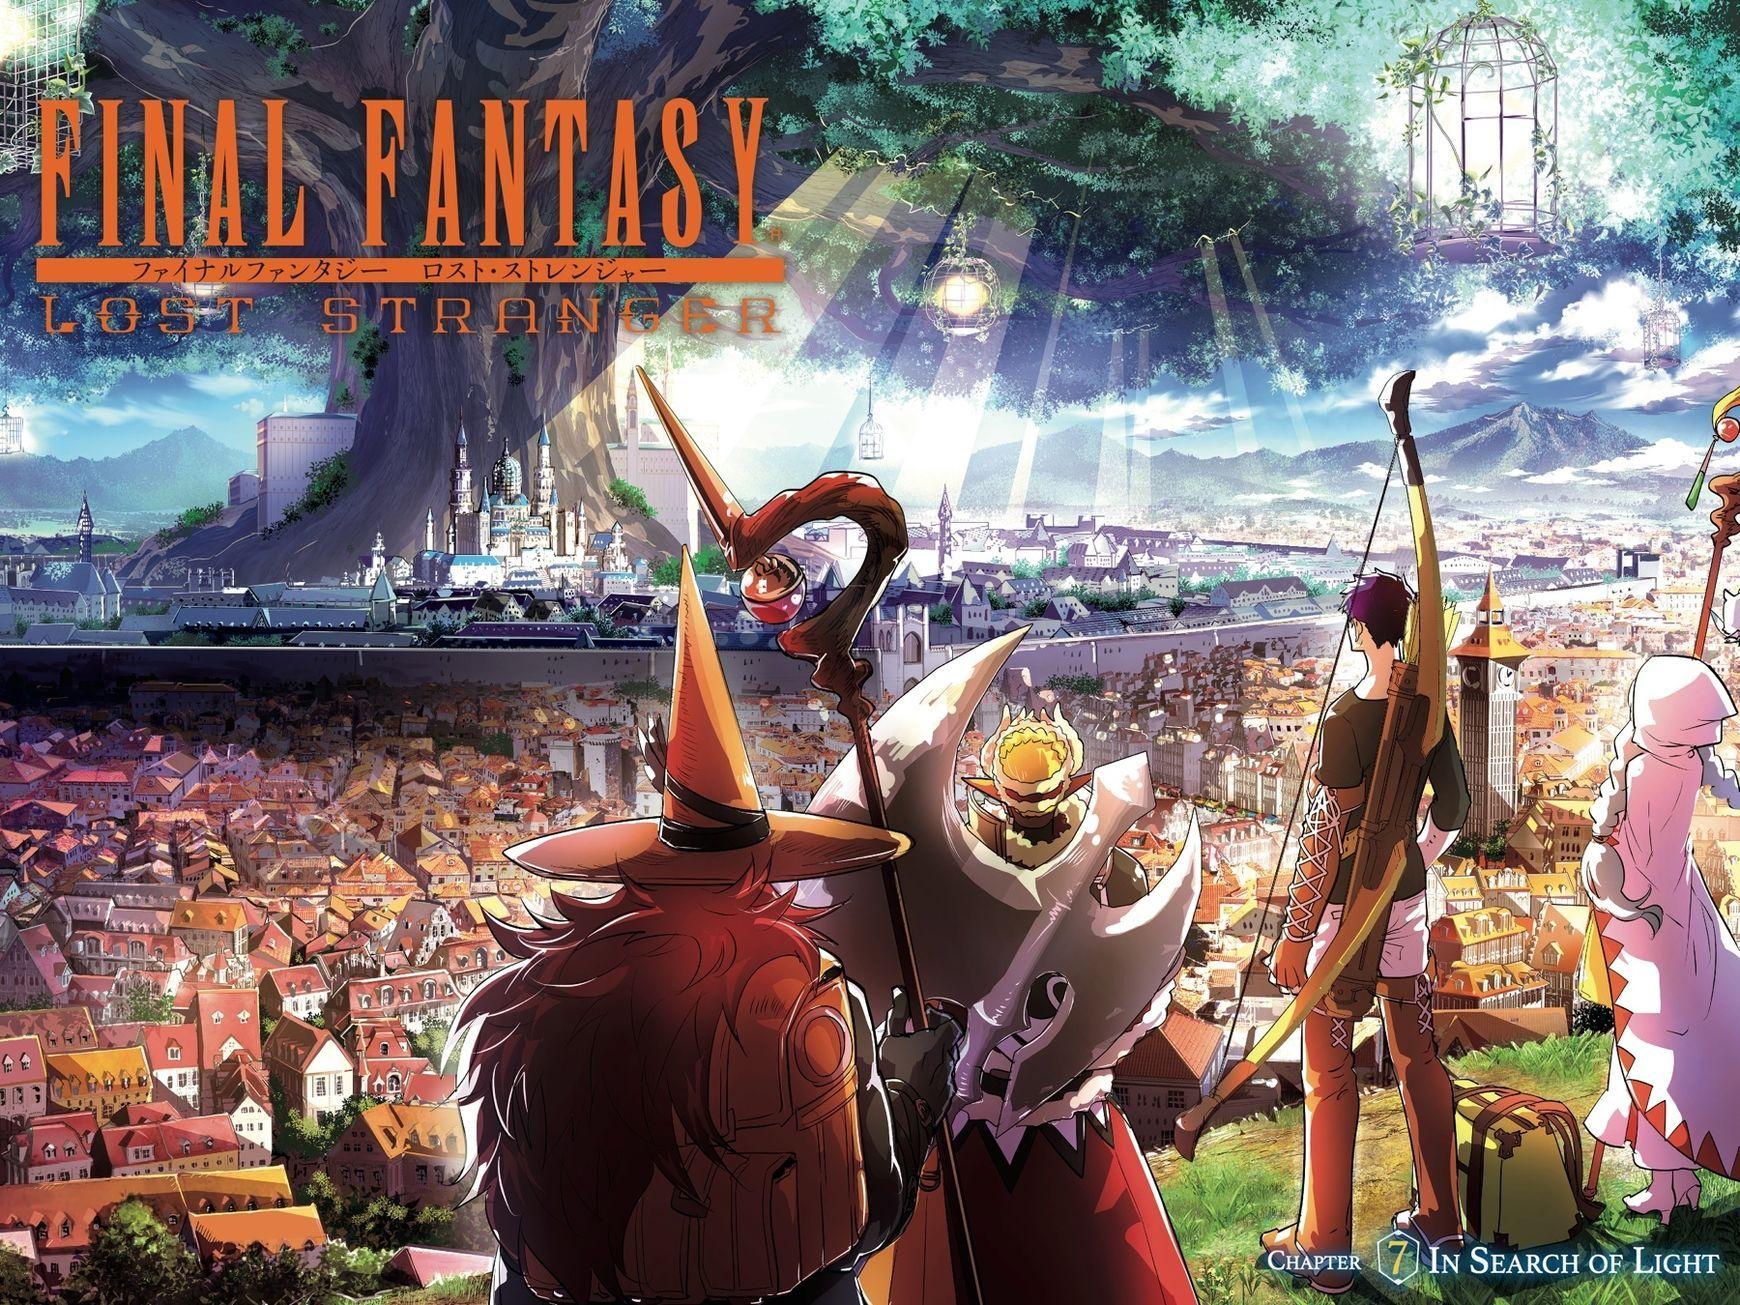 https://mangapark.me/manga/final-fantasy-lost-stranger-kameya-itsuki/s1/c007  | Final fantasy, Fantasy, Stranger